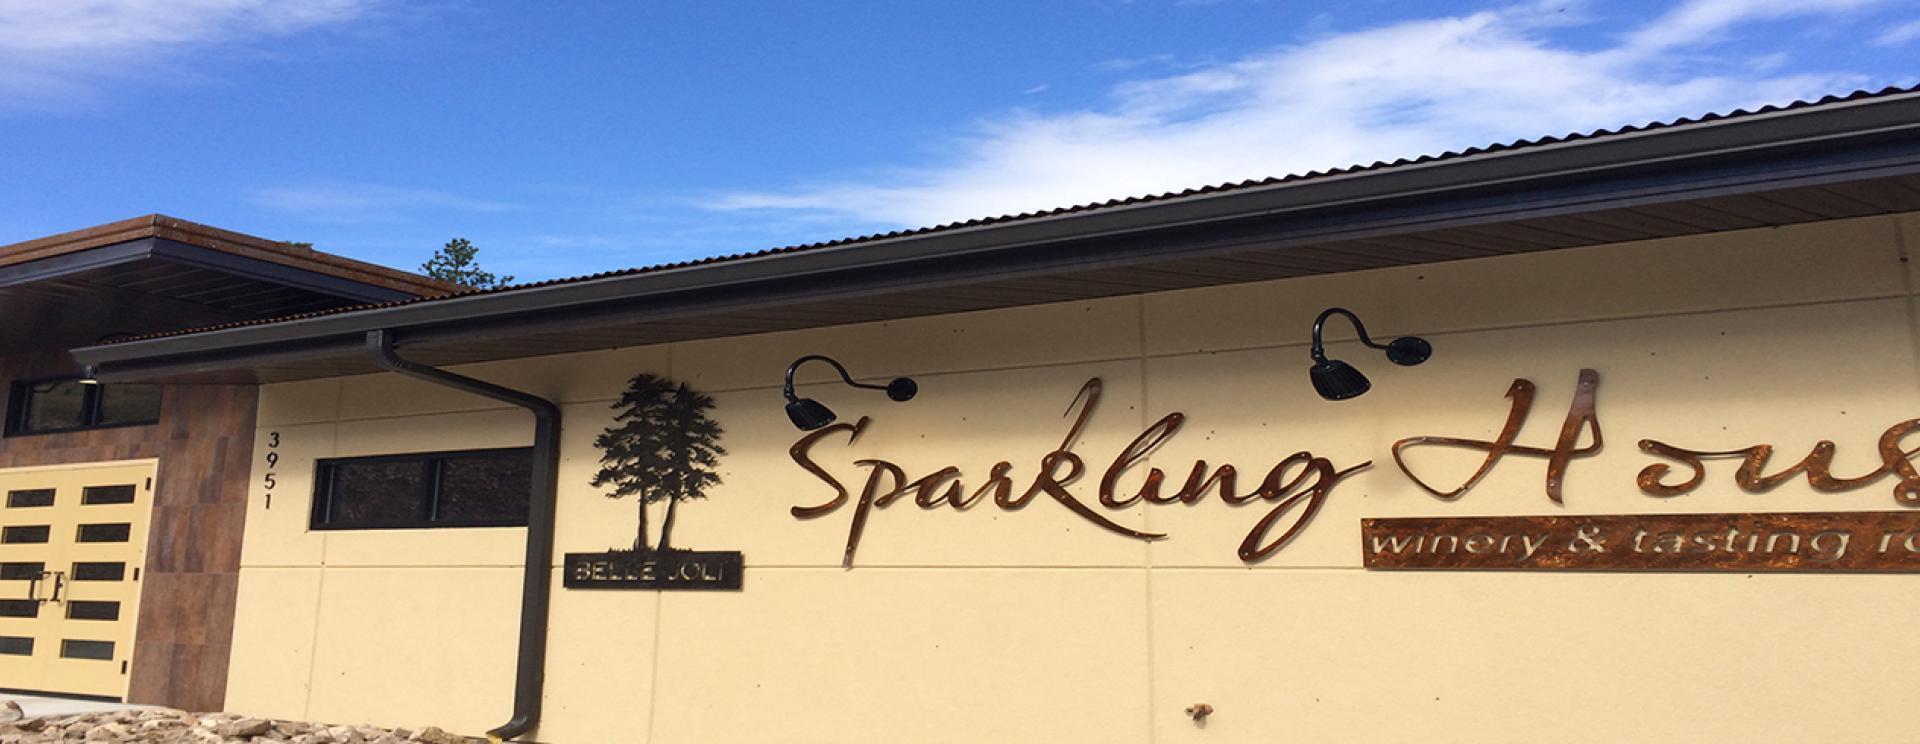 Belle Joli Winery Sparkling House